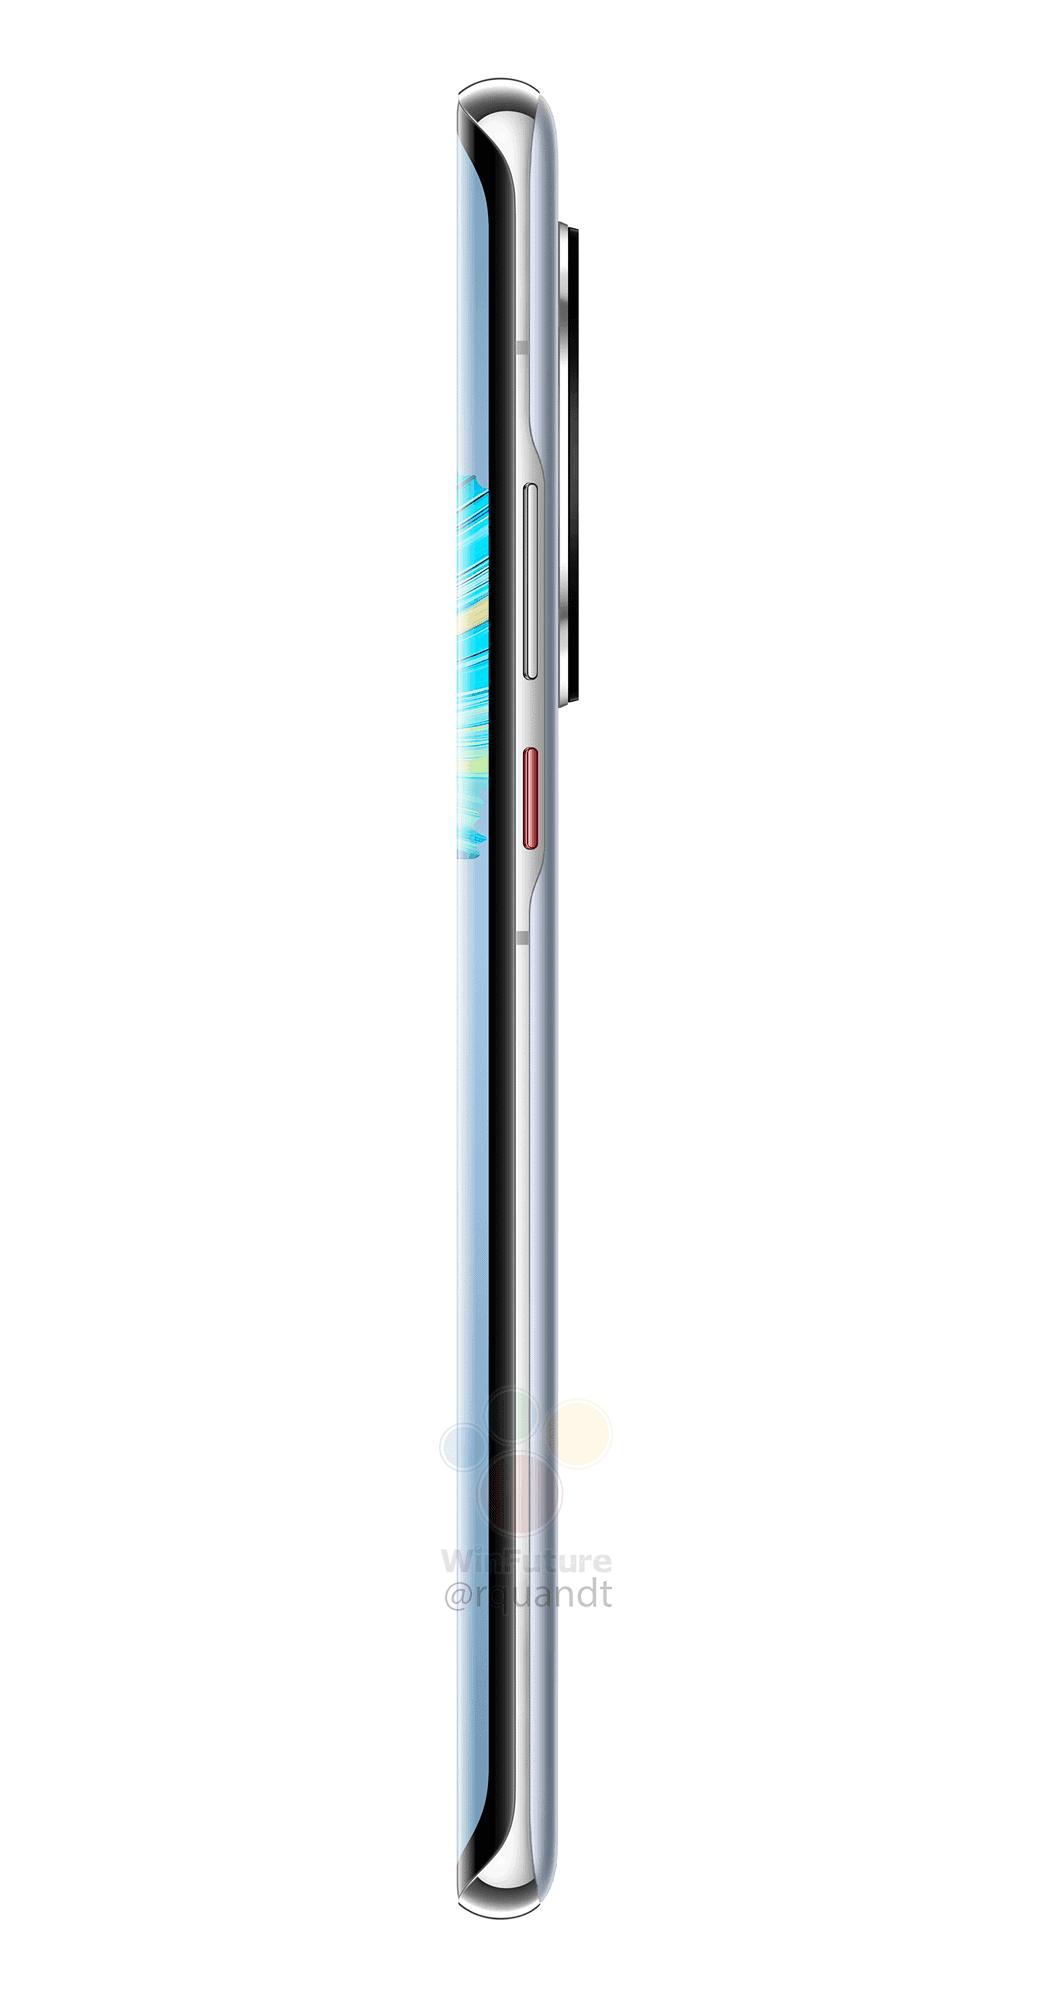 Huawei Mate 40 Pro leak 9